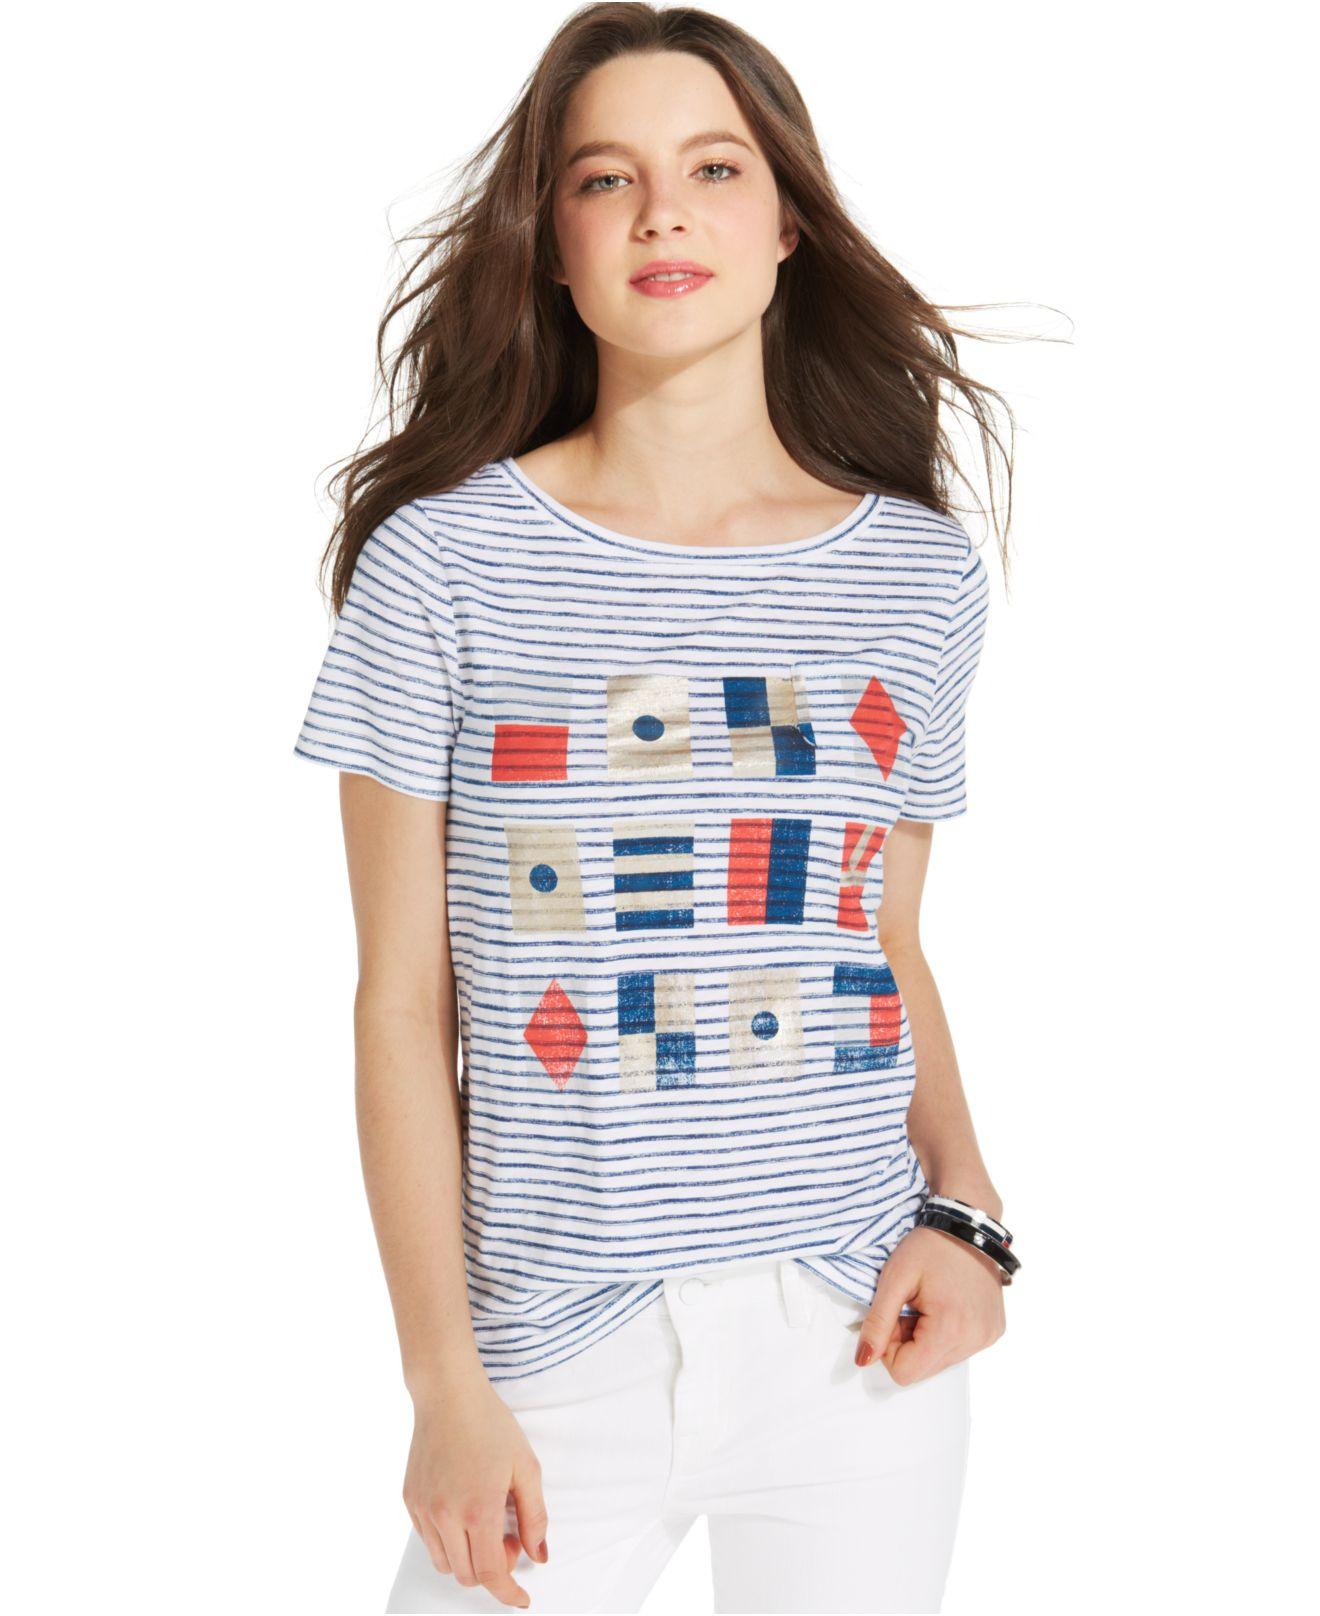 017106b2dd1f9 Lyst - Tommy Hilfiger Boat-Neck Flag Stripe Tee in White